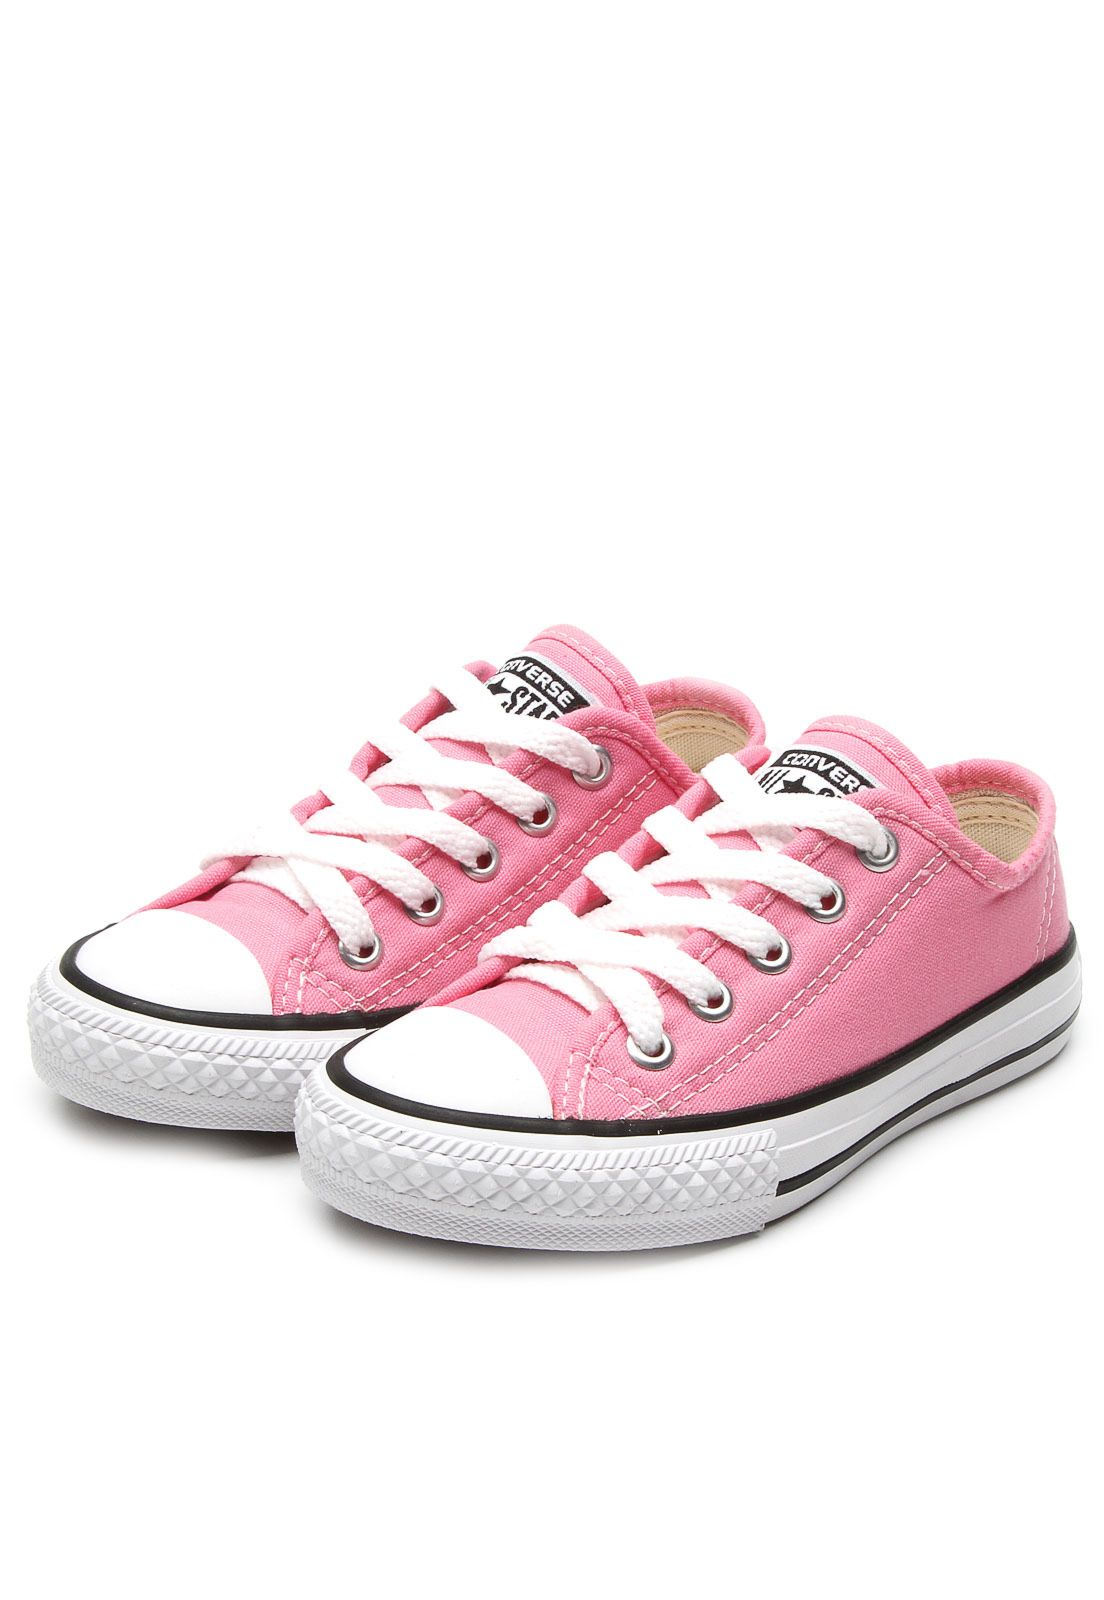 Tênis Converse Chuck Taylor All Star Infantil Rosa